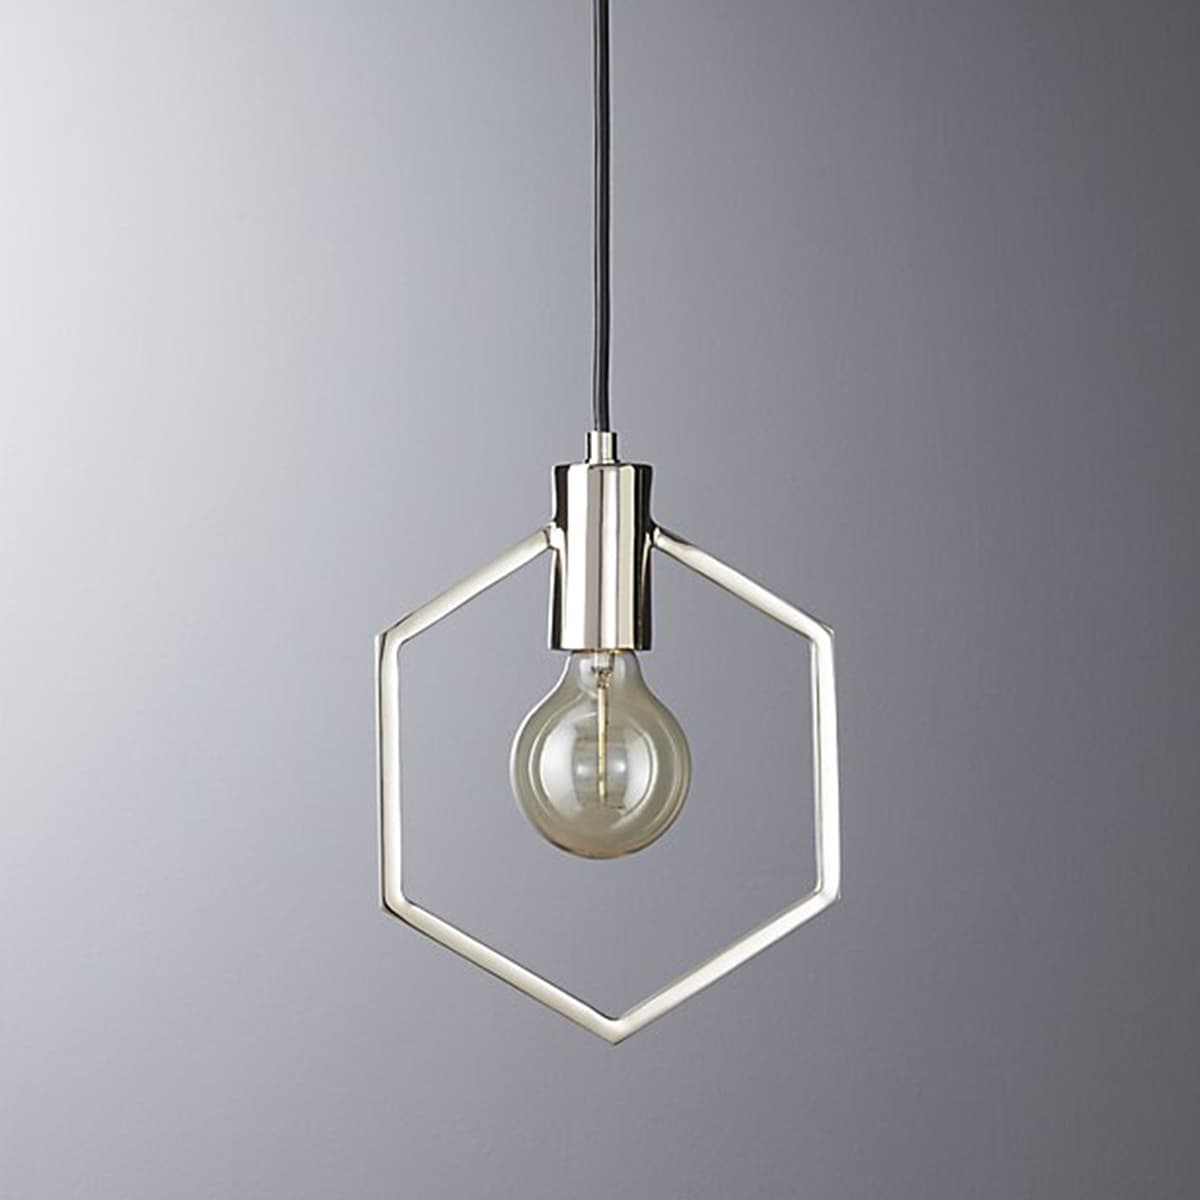 10 Budget-Friendly Kitchen Pendant Lights: gallery image 6